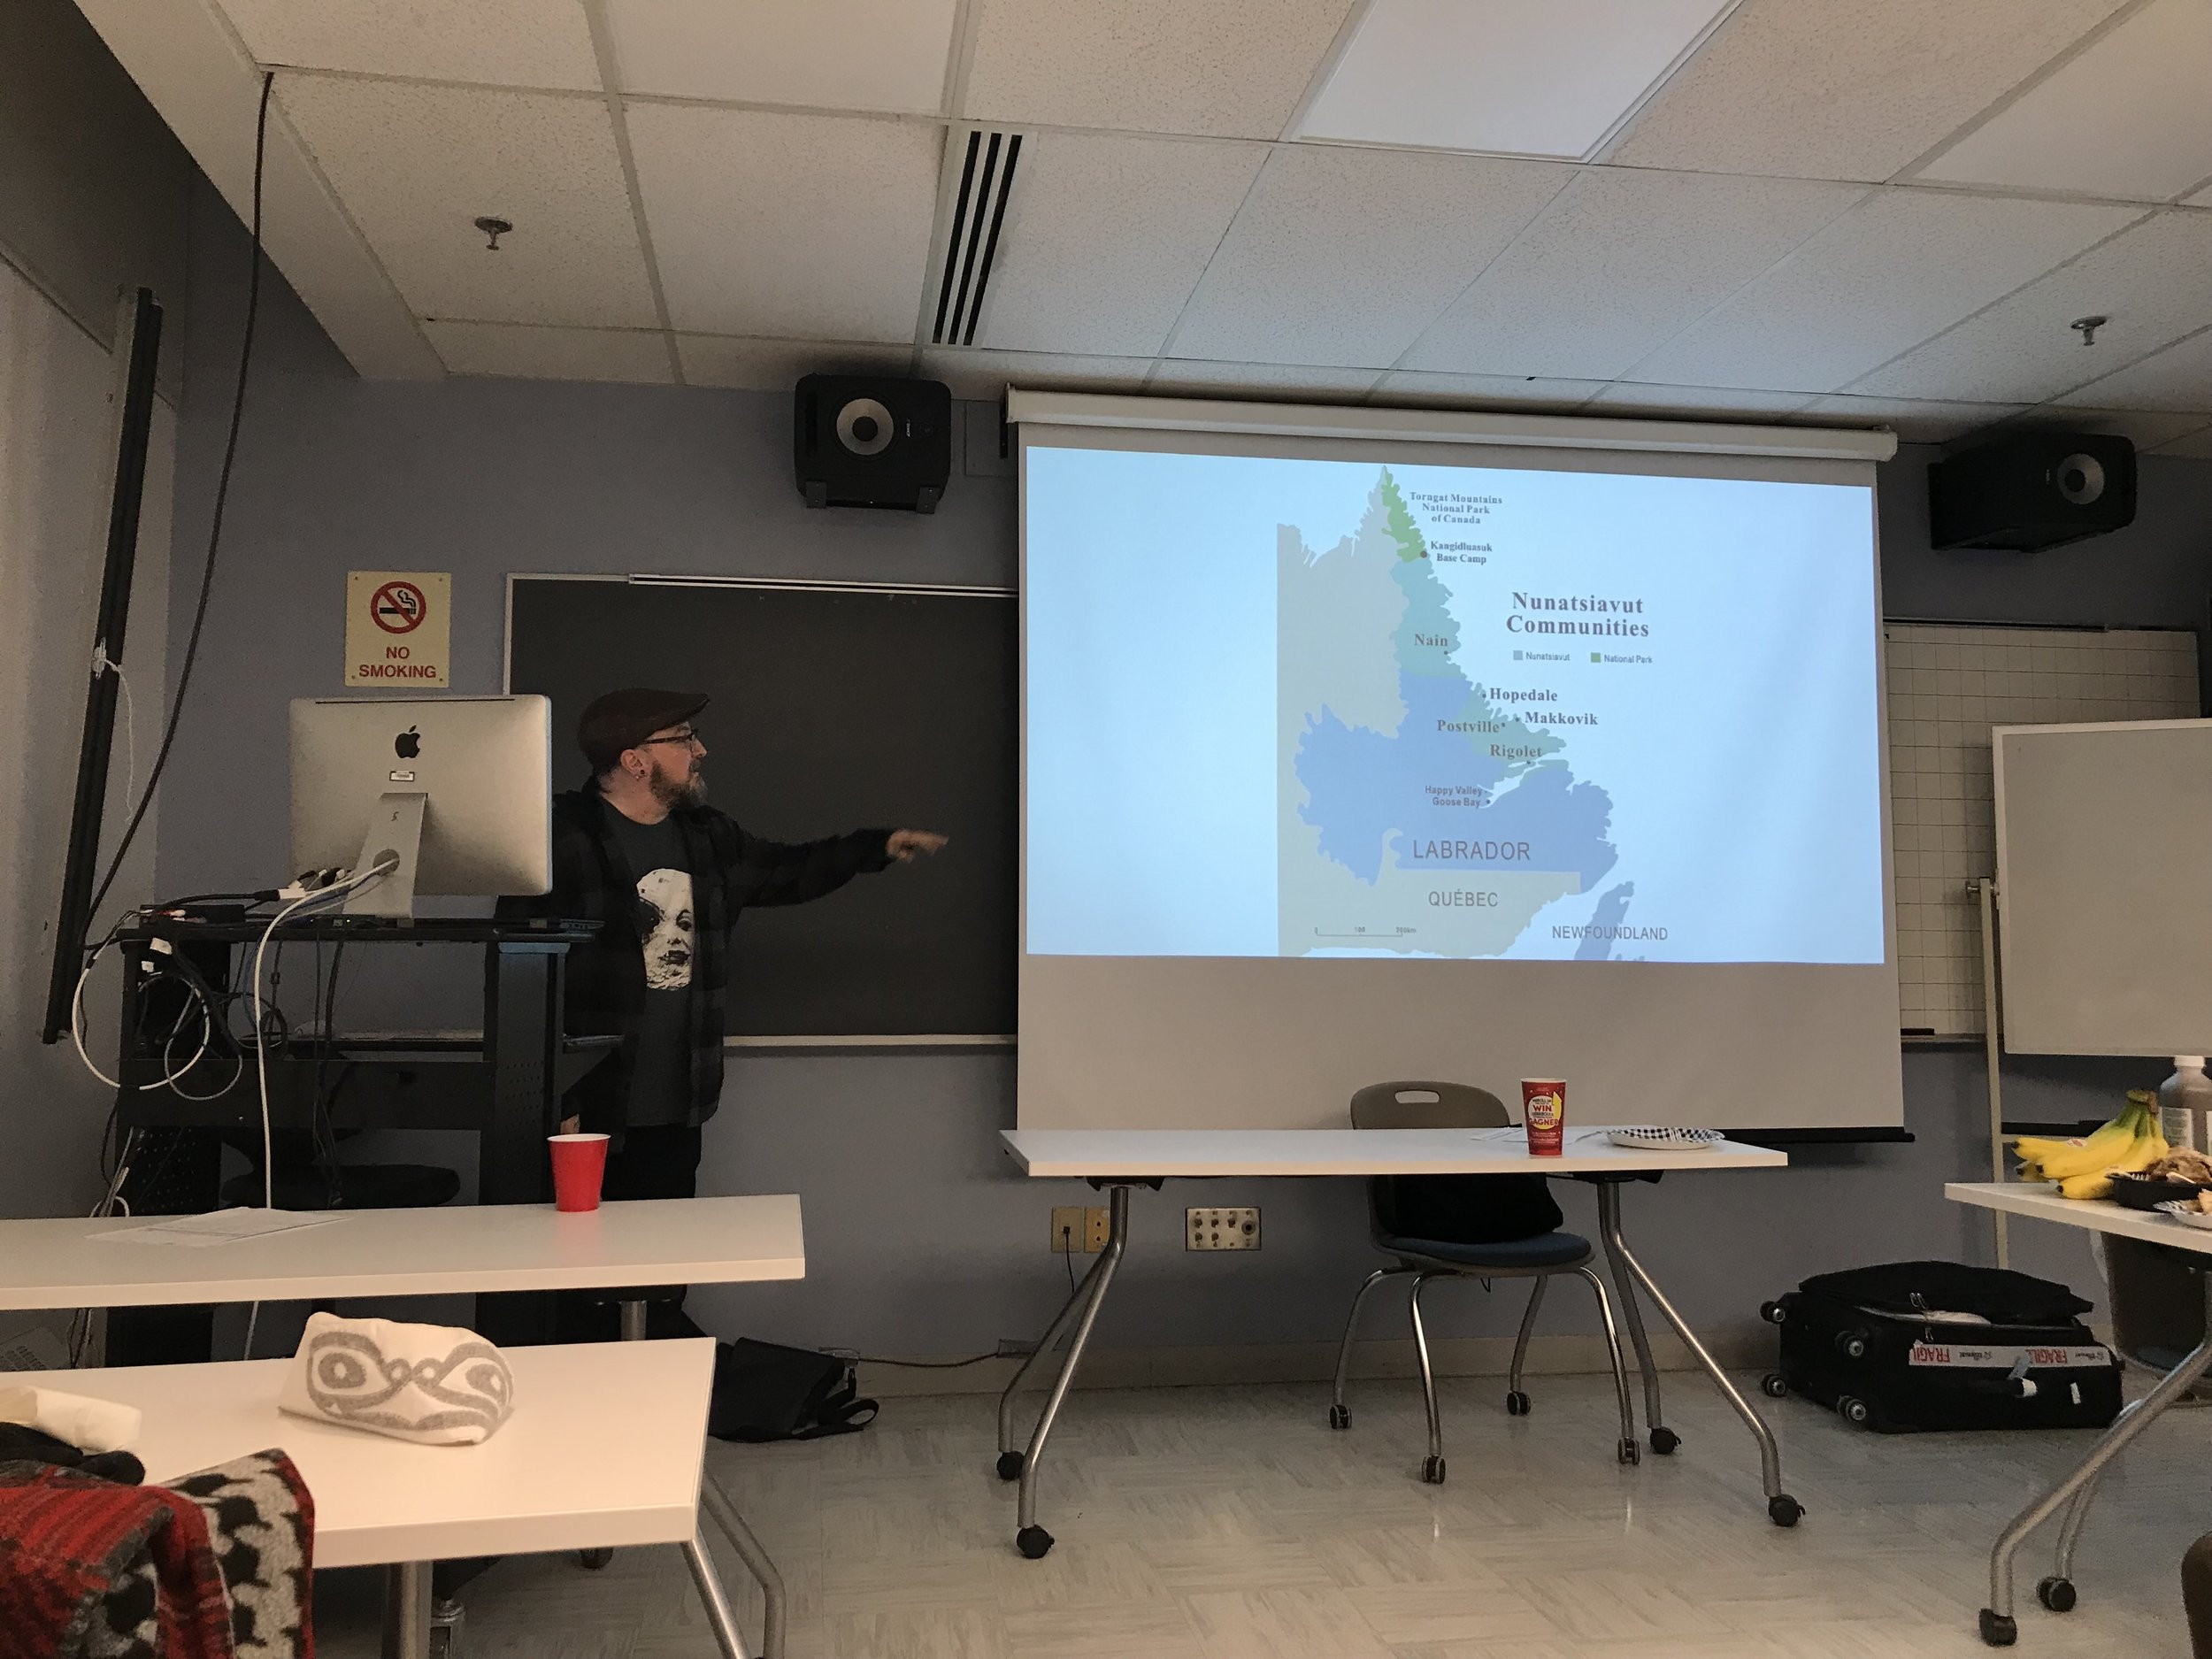 Glenn talks about Nunatsiavut